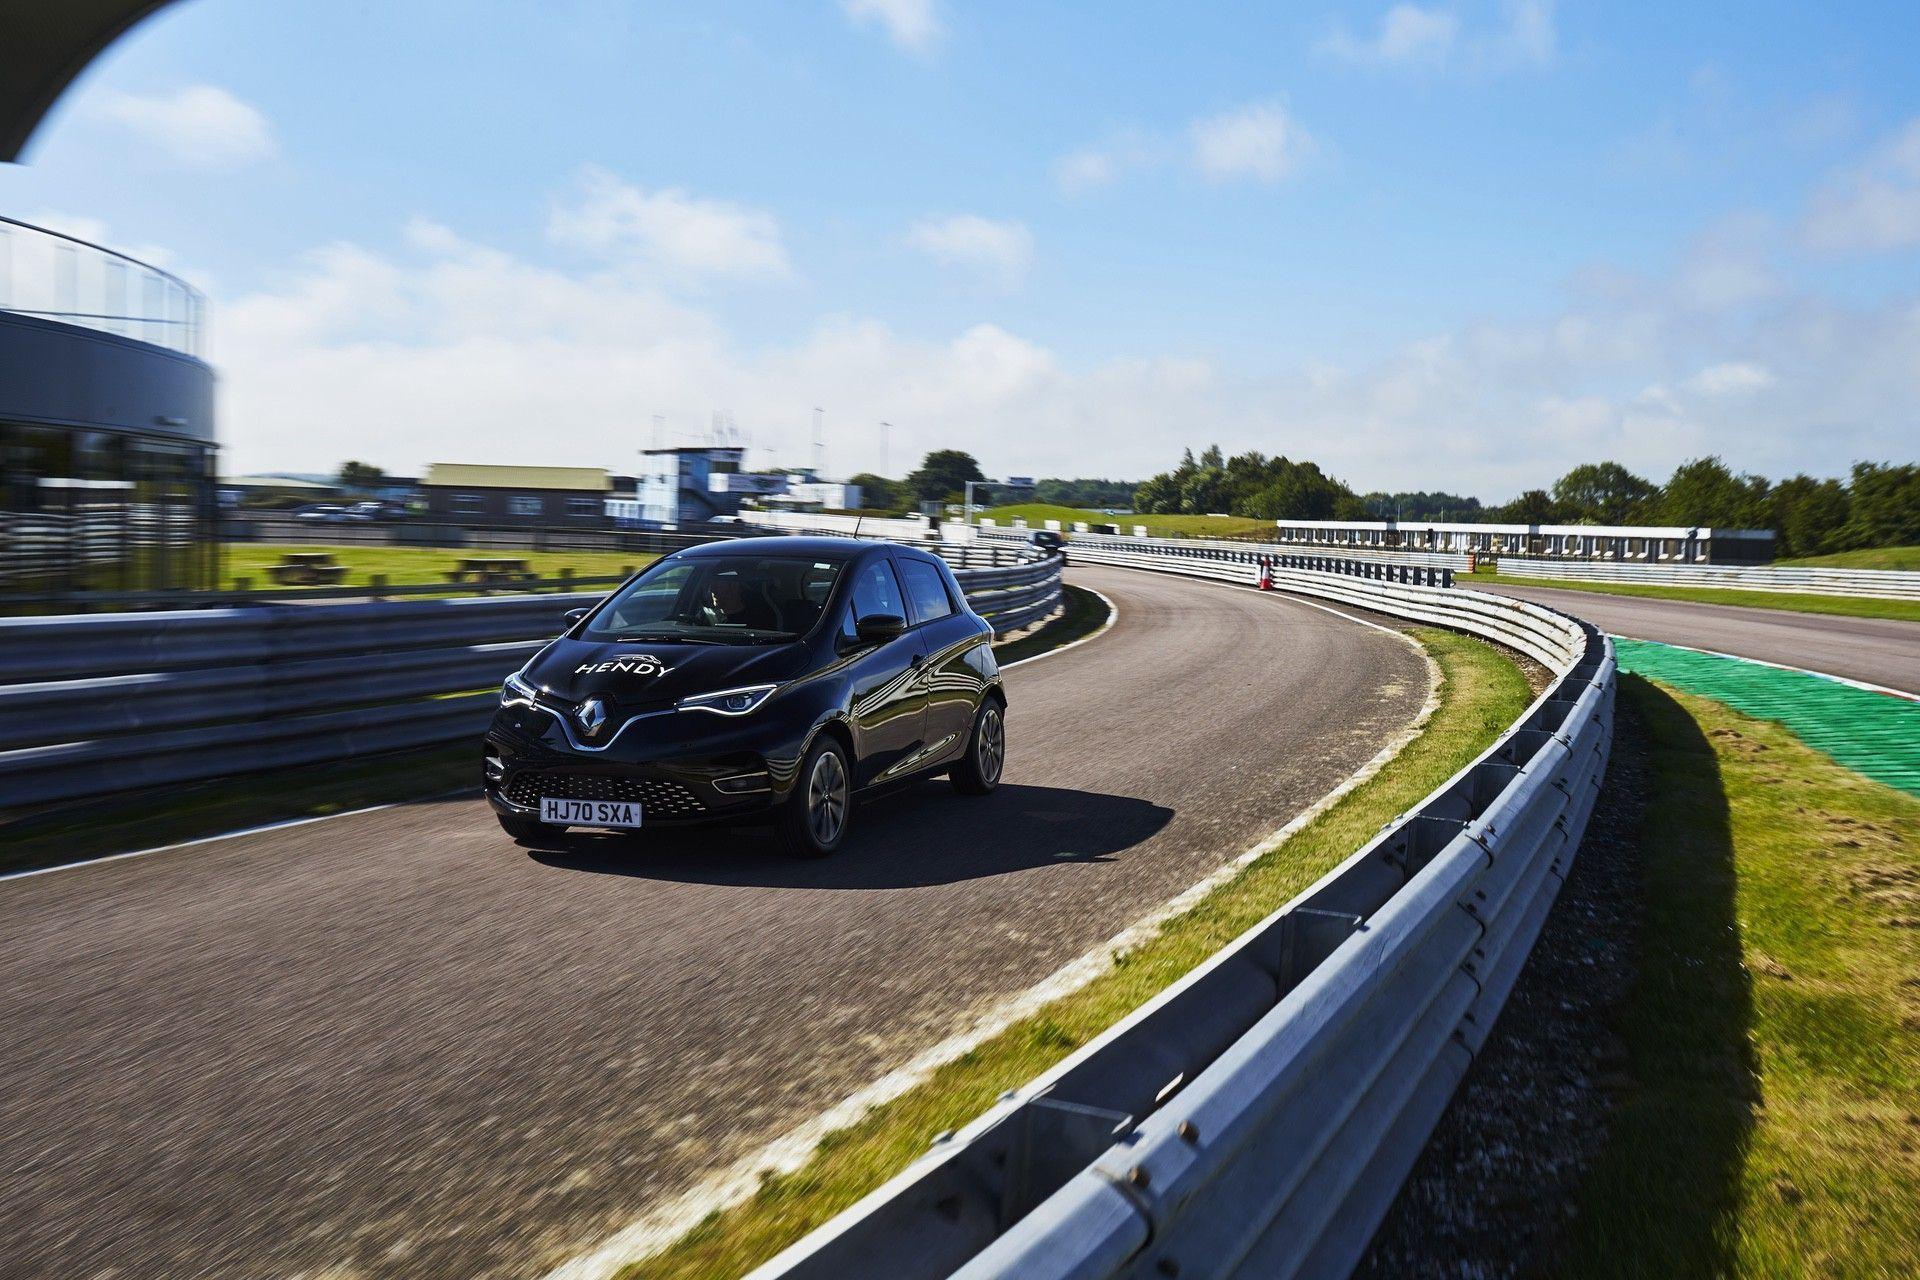 Renault_Zoe_hypermiling_record-0003